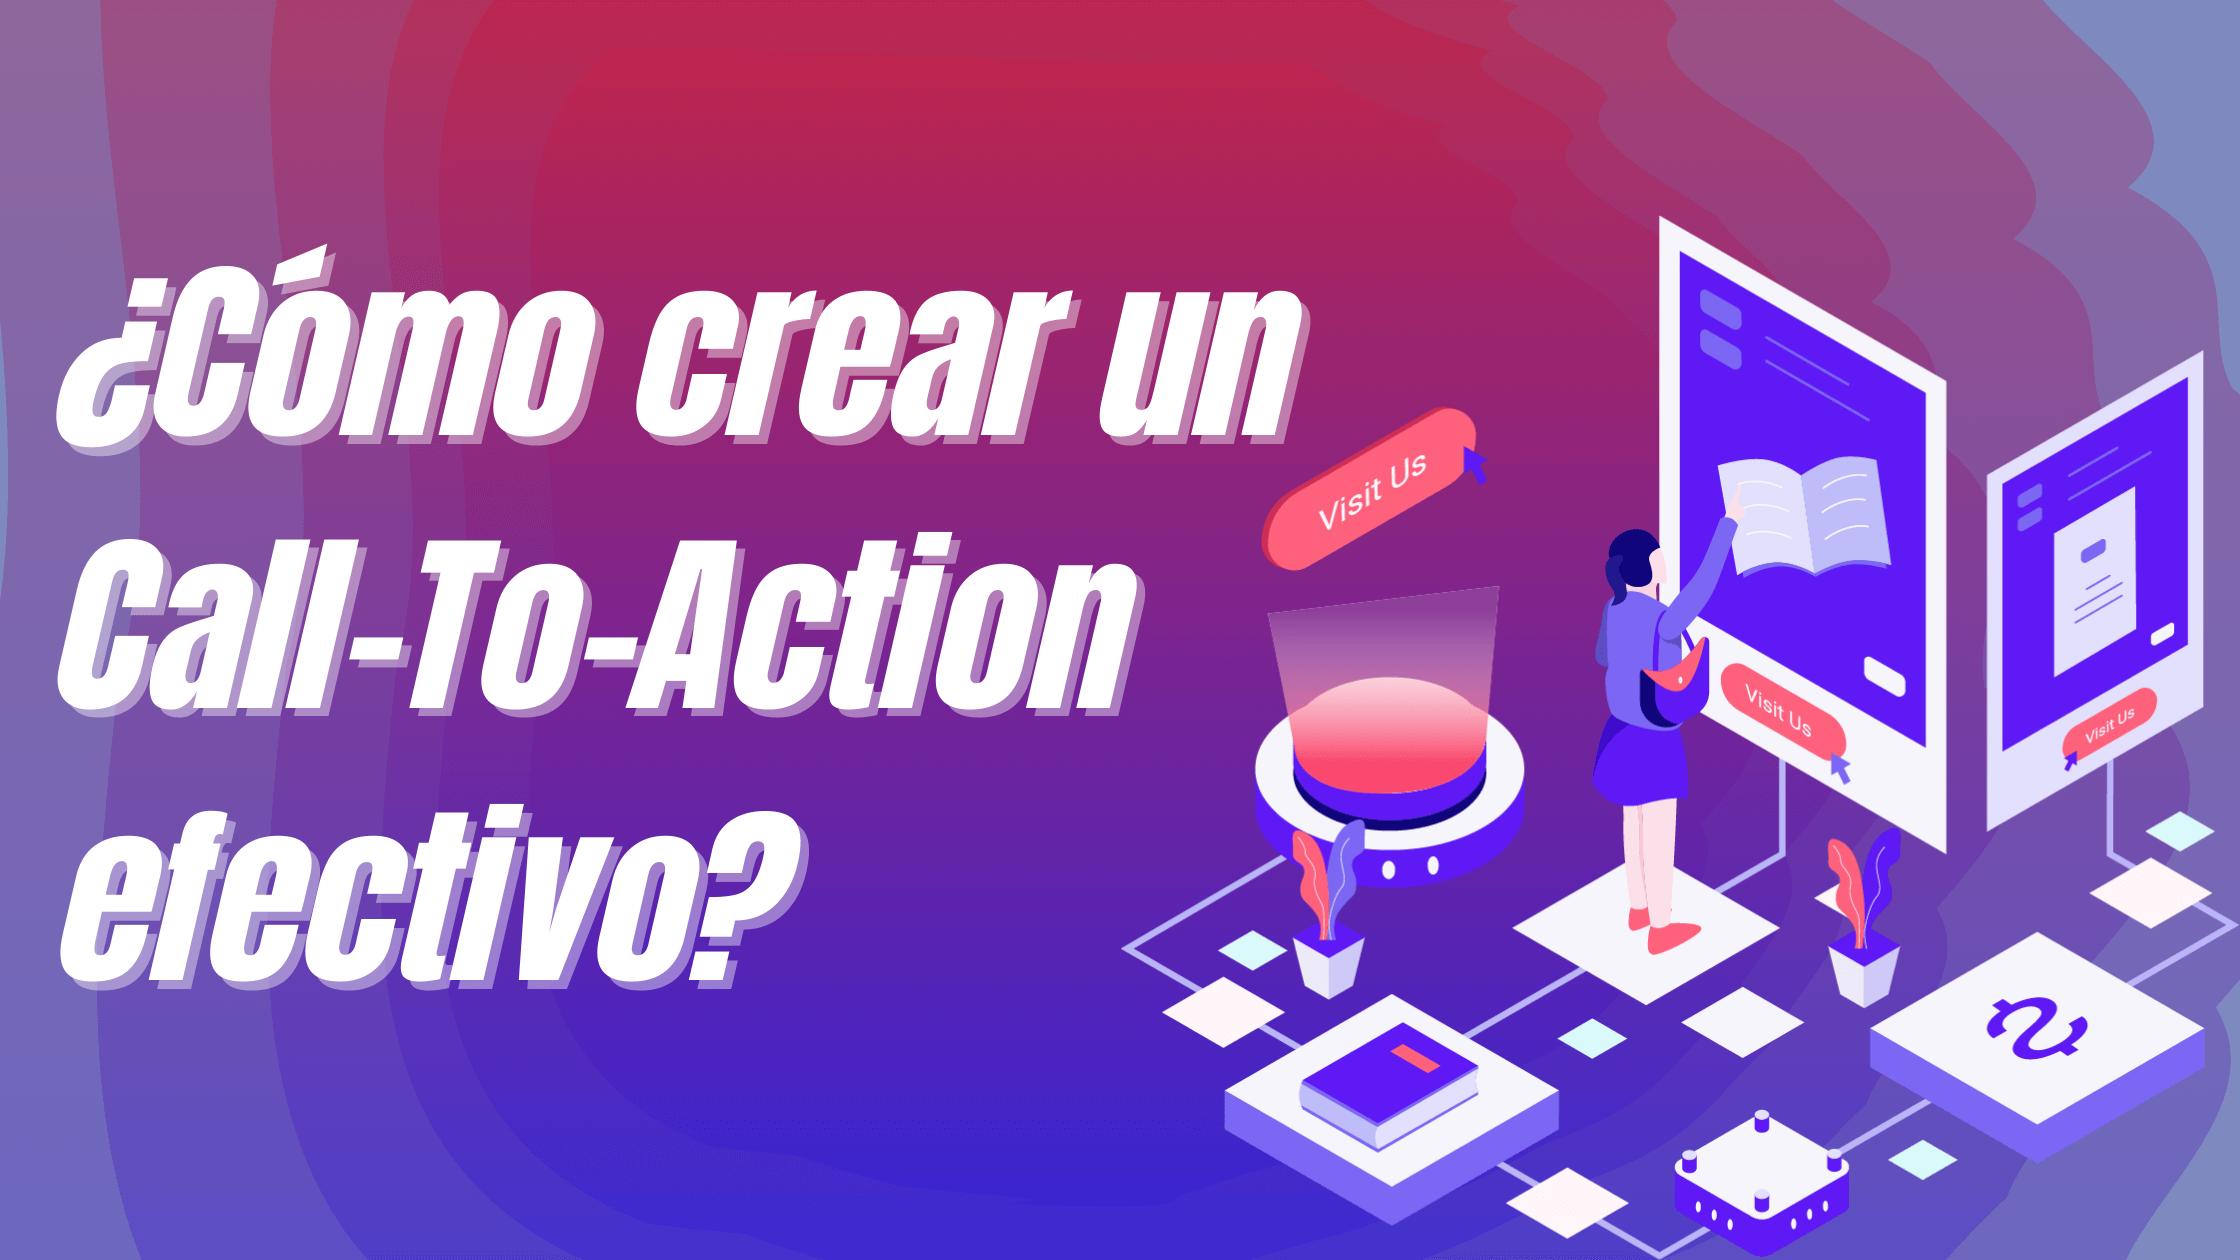 ¿Cómo crear un Call-To-Action efectivo?